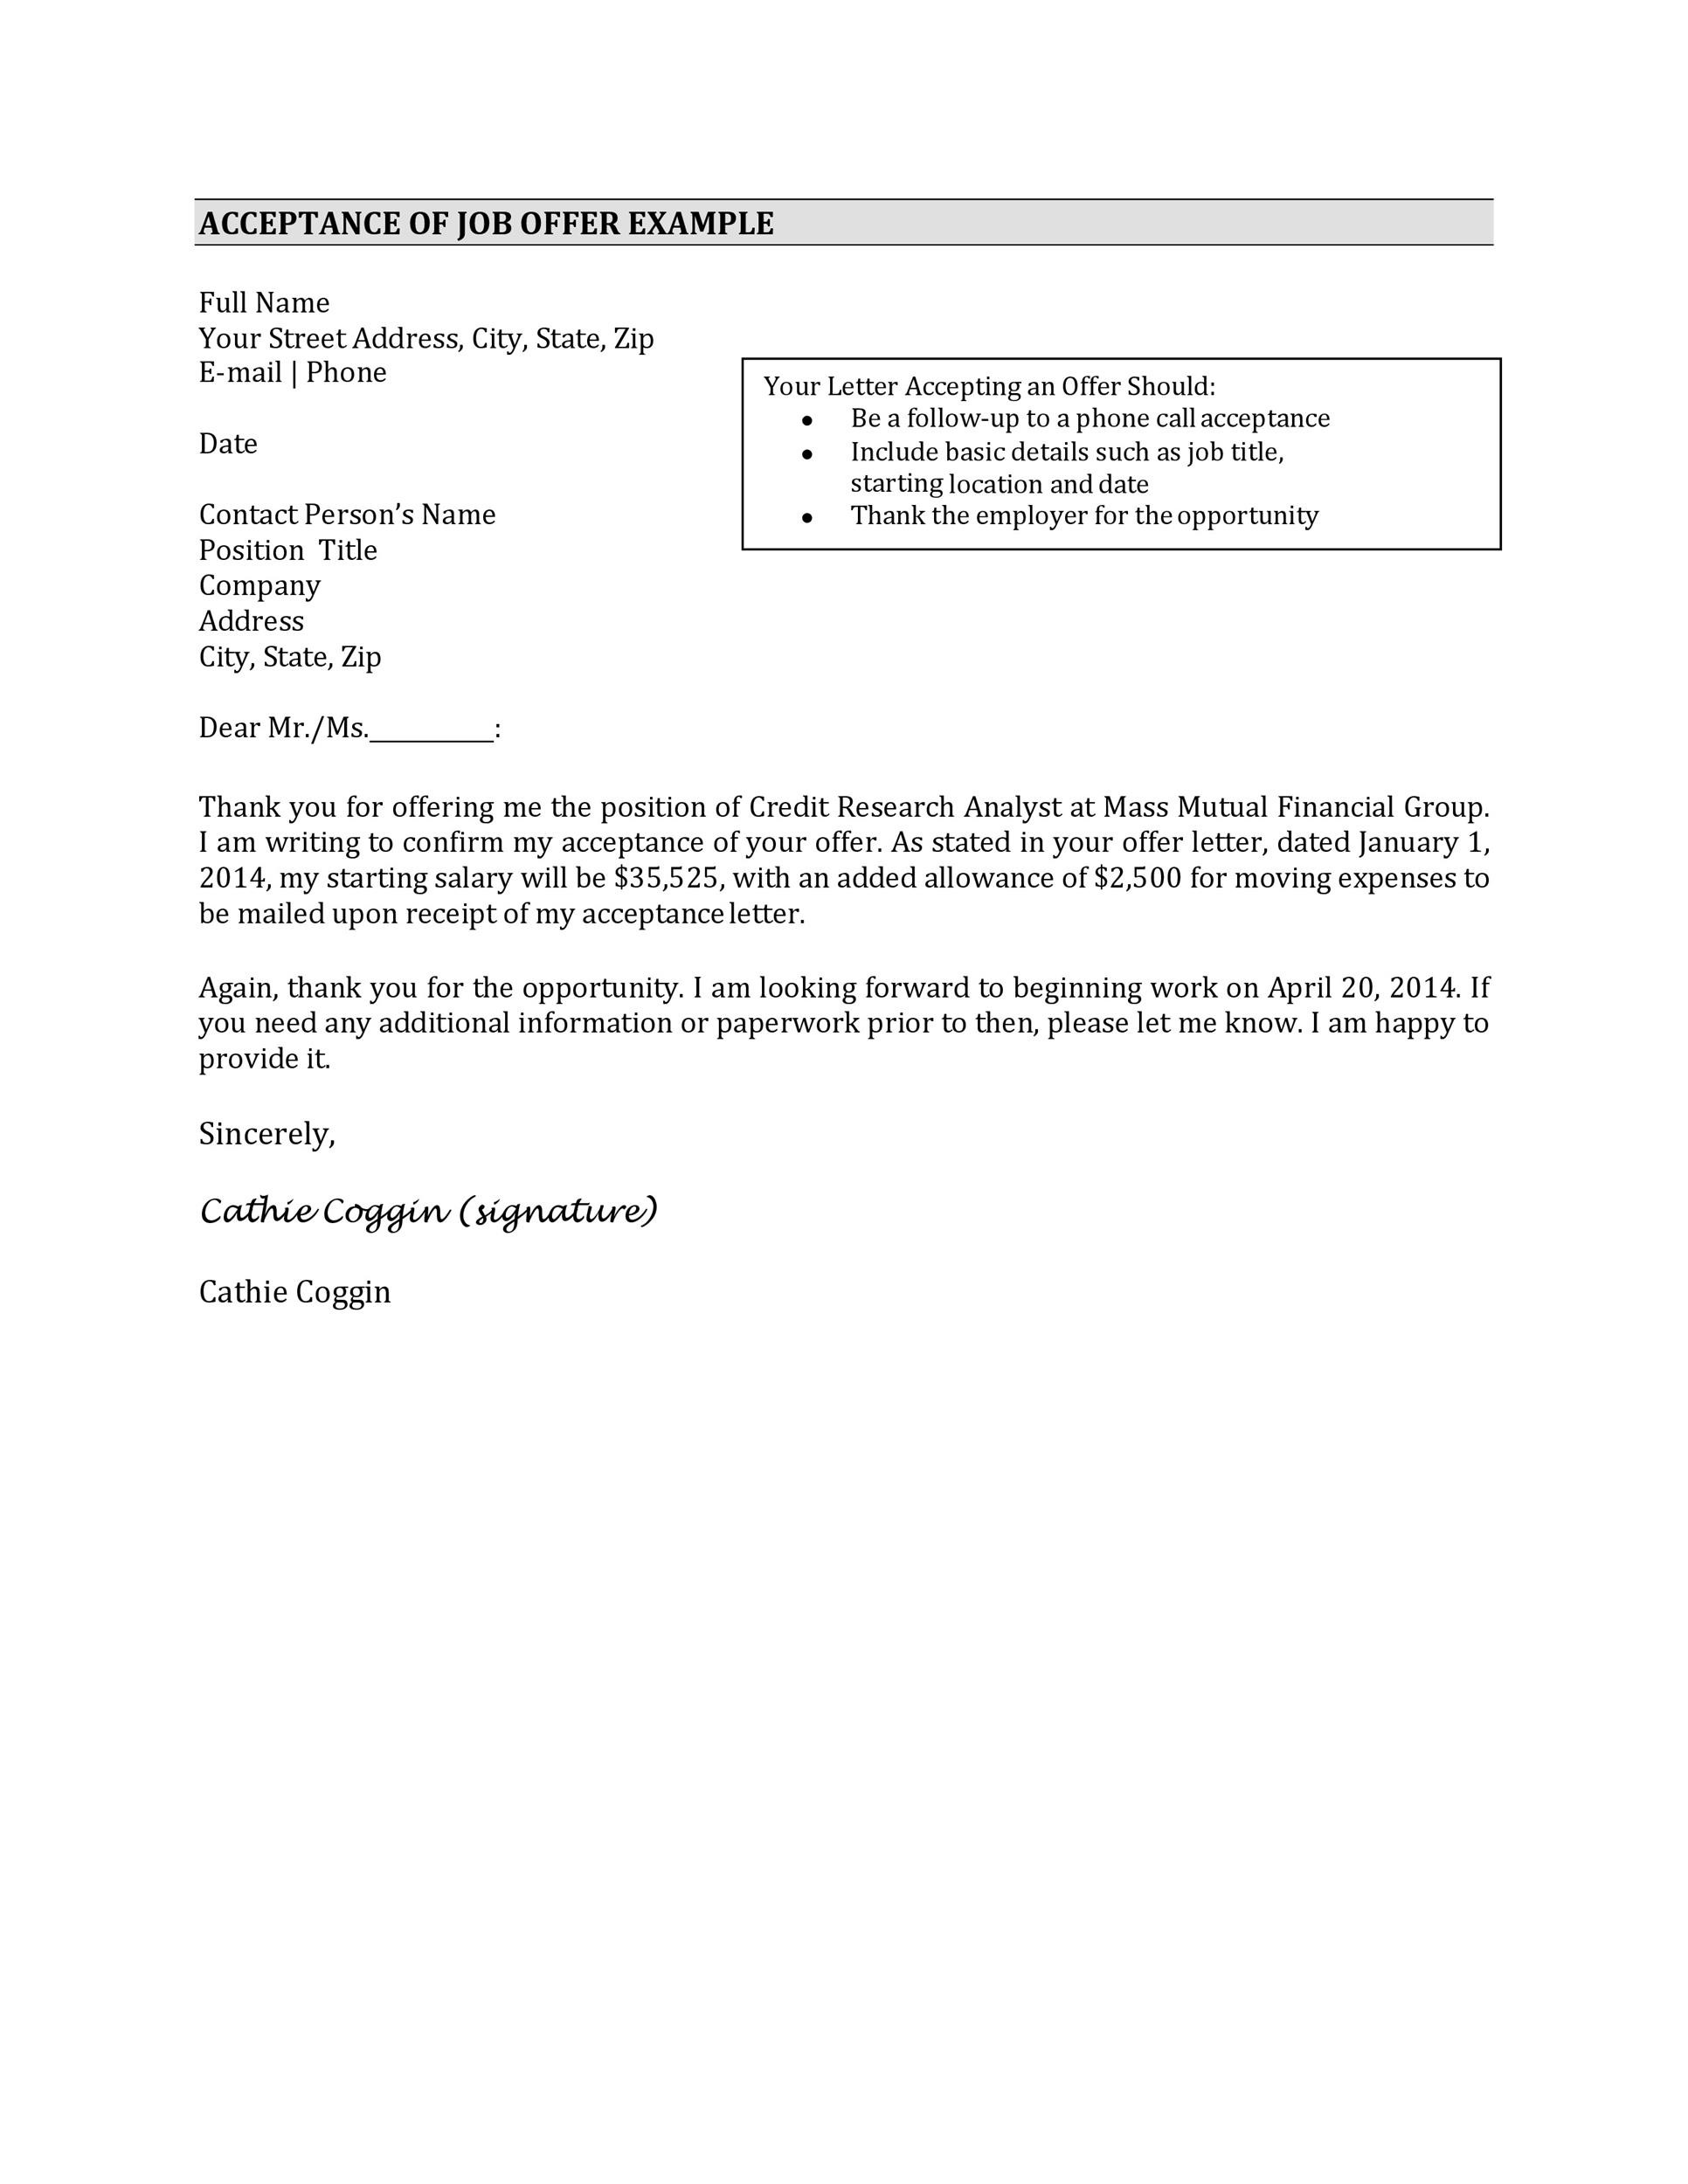 Free job acceptance letter 27